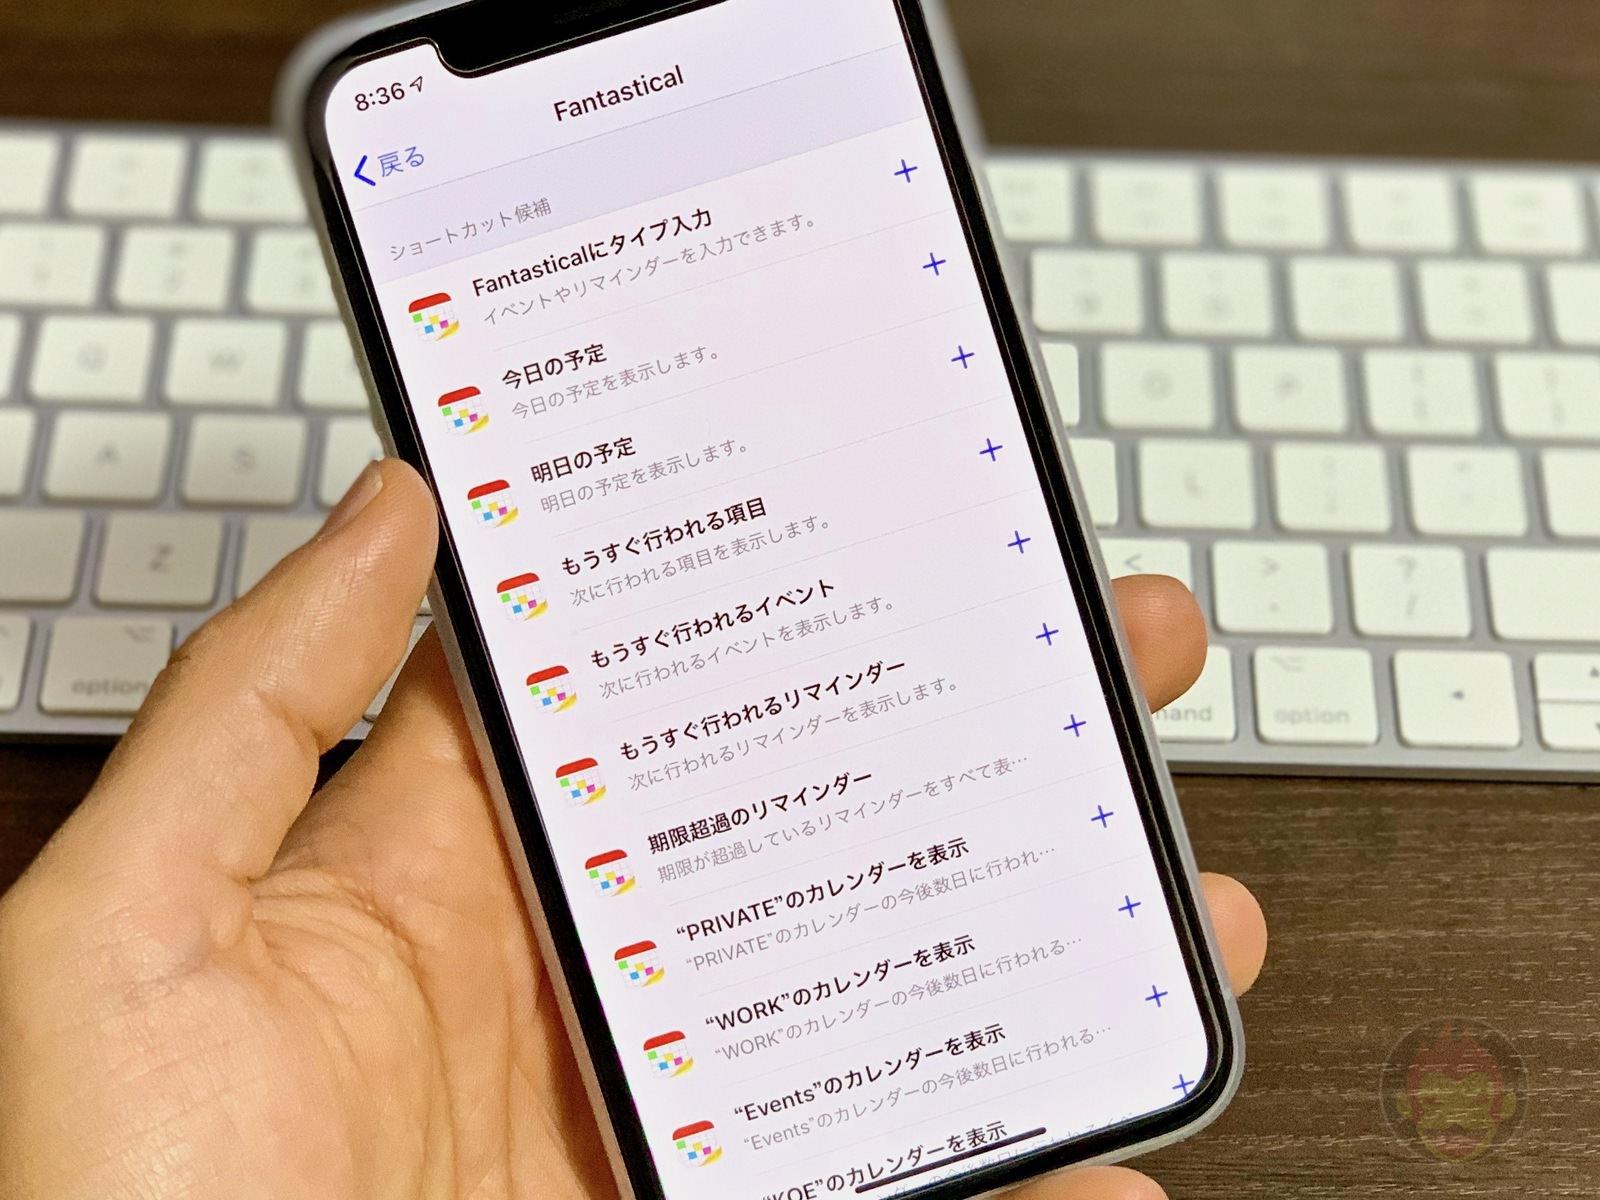 Fantastical Siri Shortcuts all 01